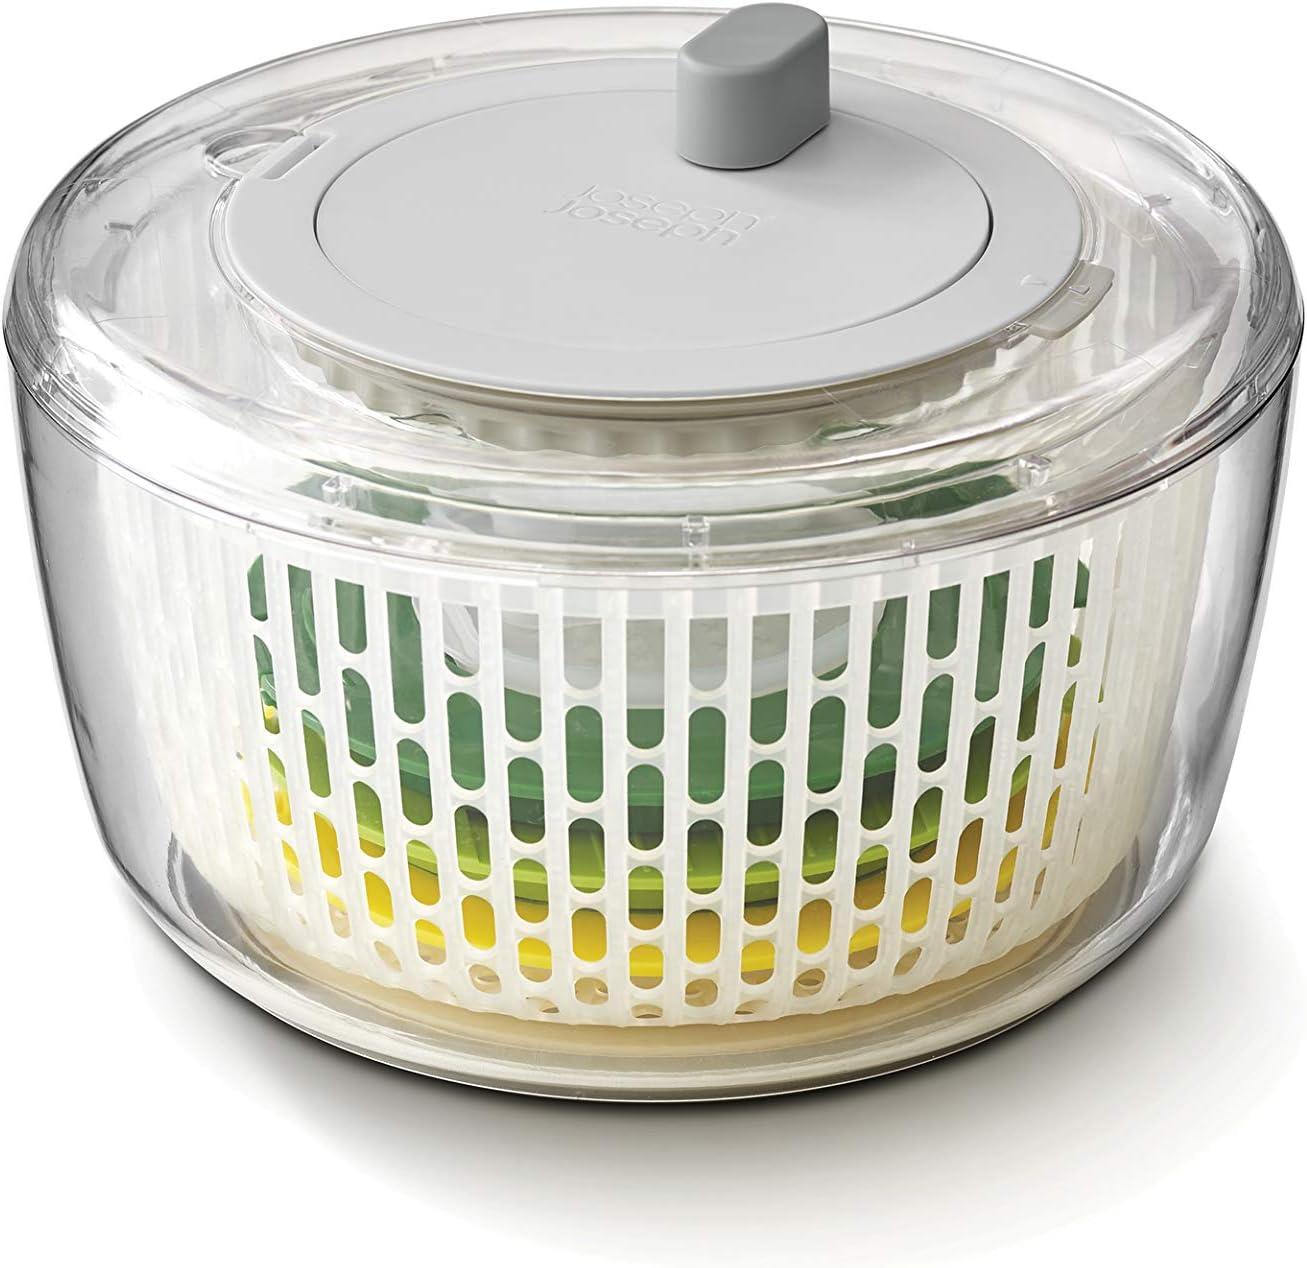 Joseph Multi-Prep 4-Piece Charlotte Mall Preparation with Salad Set gift Spin